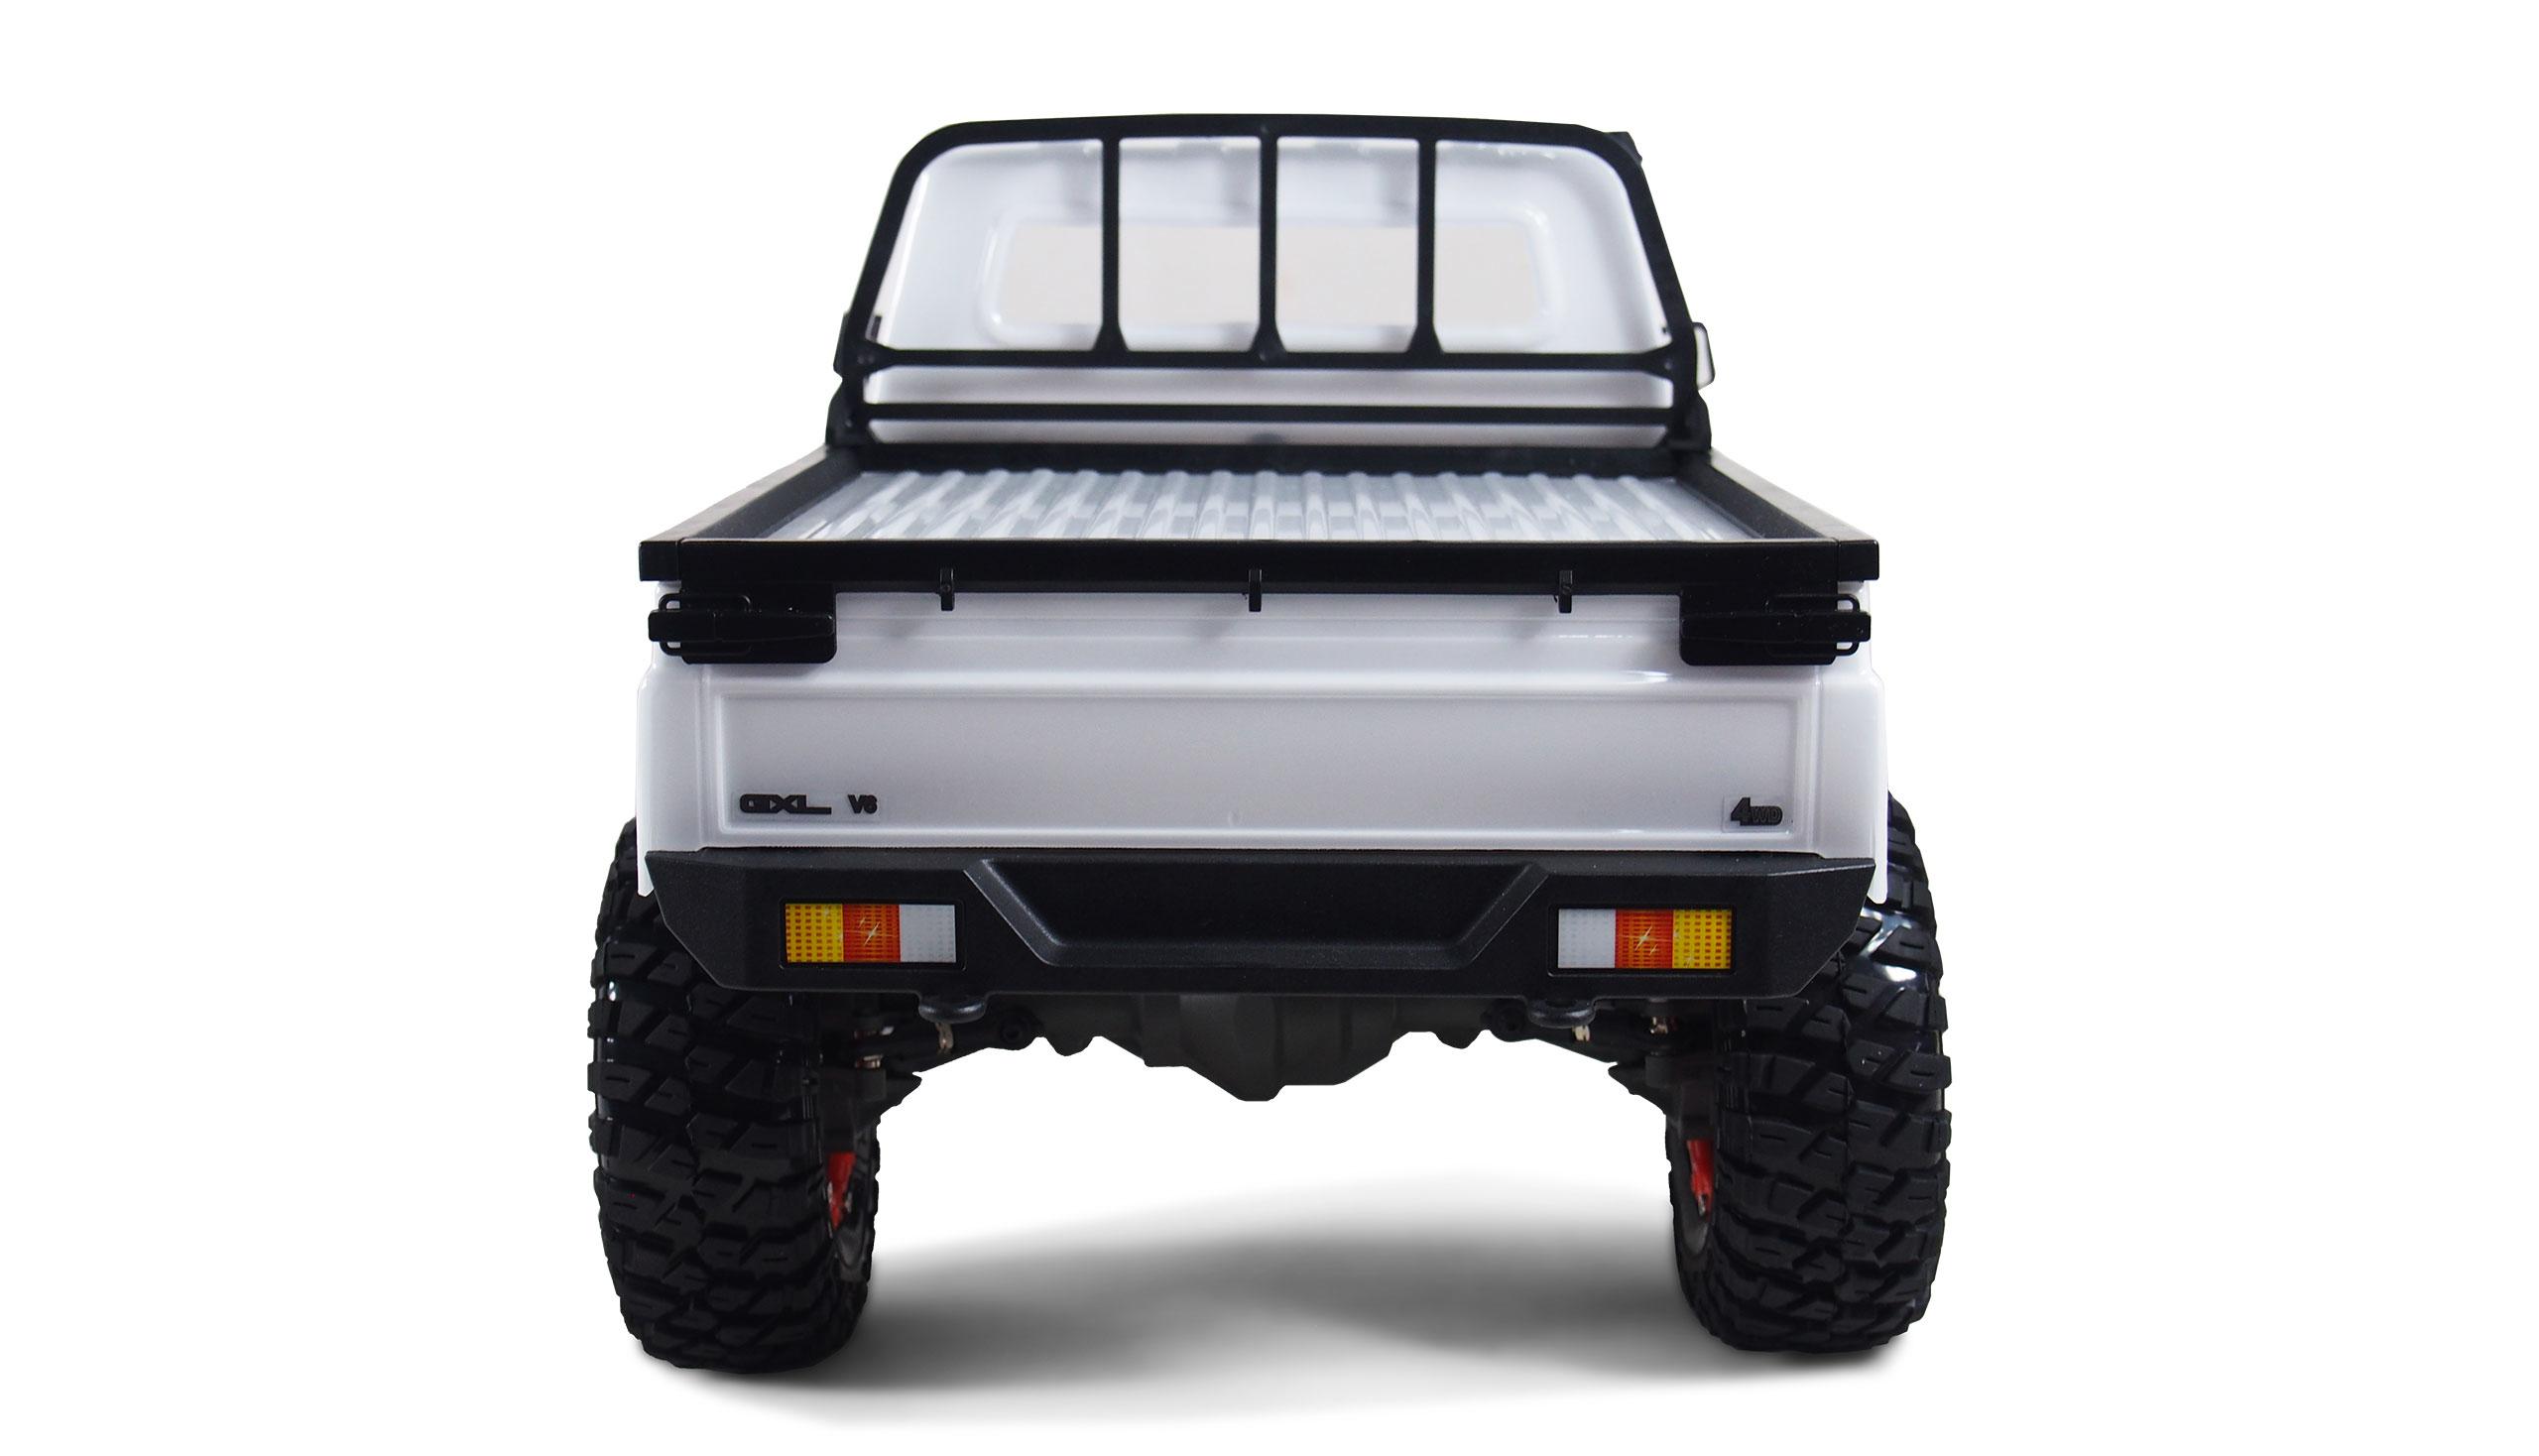 Amewi AMXRock RCX10P Scale Crawler - Raupenfahrzeug - Elektromotor - 1:10 - Betriebsbereit (RTR) - Schwarz - Weiß - Aluminium - Metall